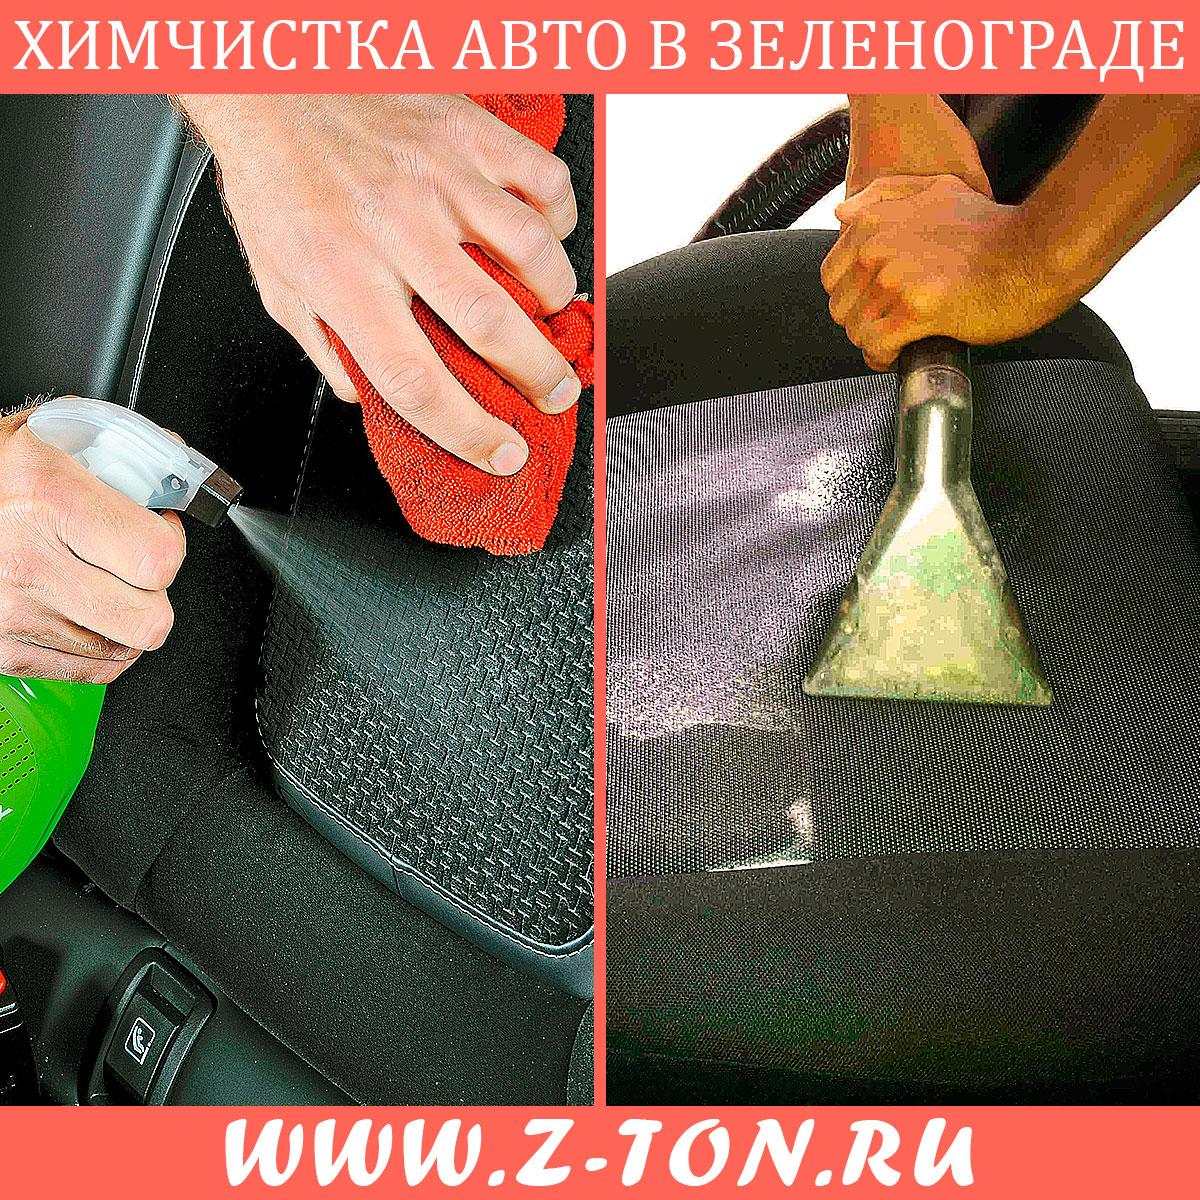 Химчистка салона автомобиля в Зеленограде